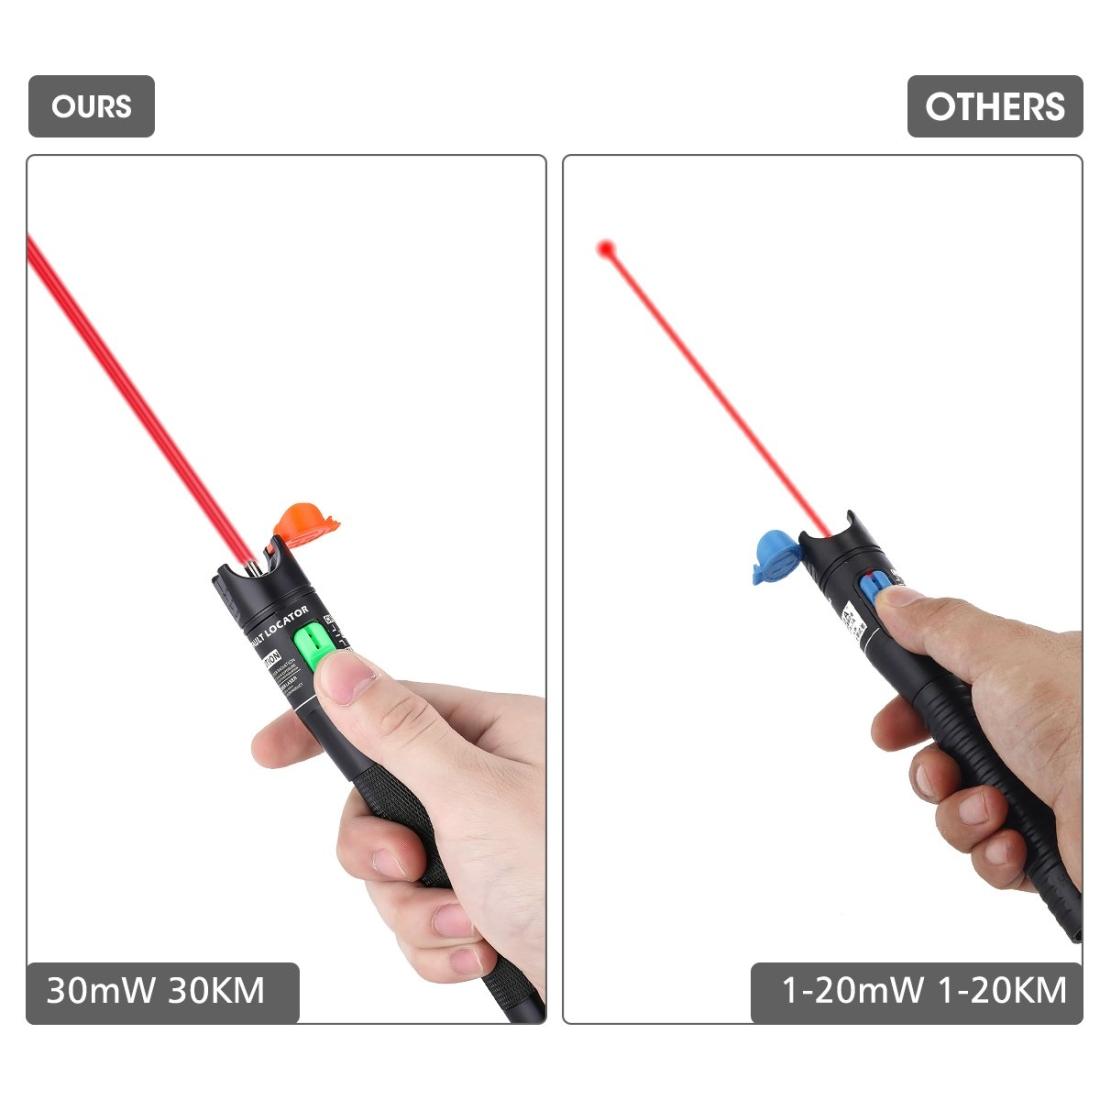 HT-30 30mW Visual Fault Locator Detector Tester Optical Laser Red Light Test Pen